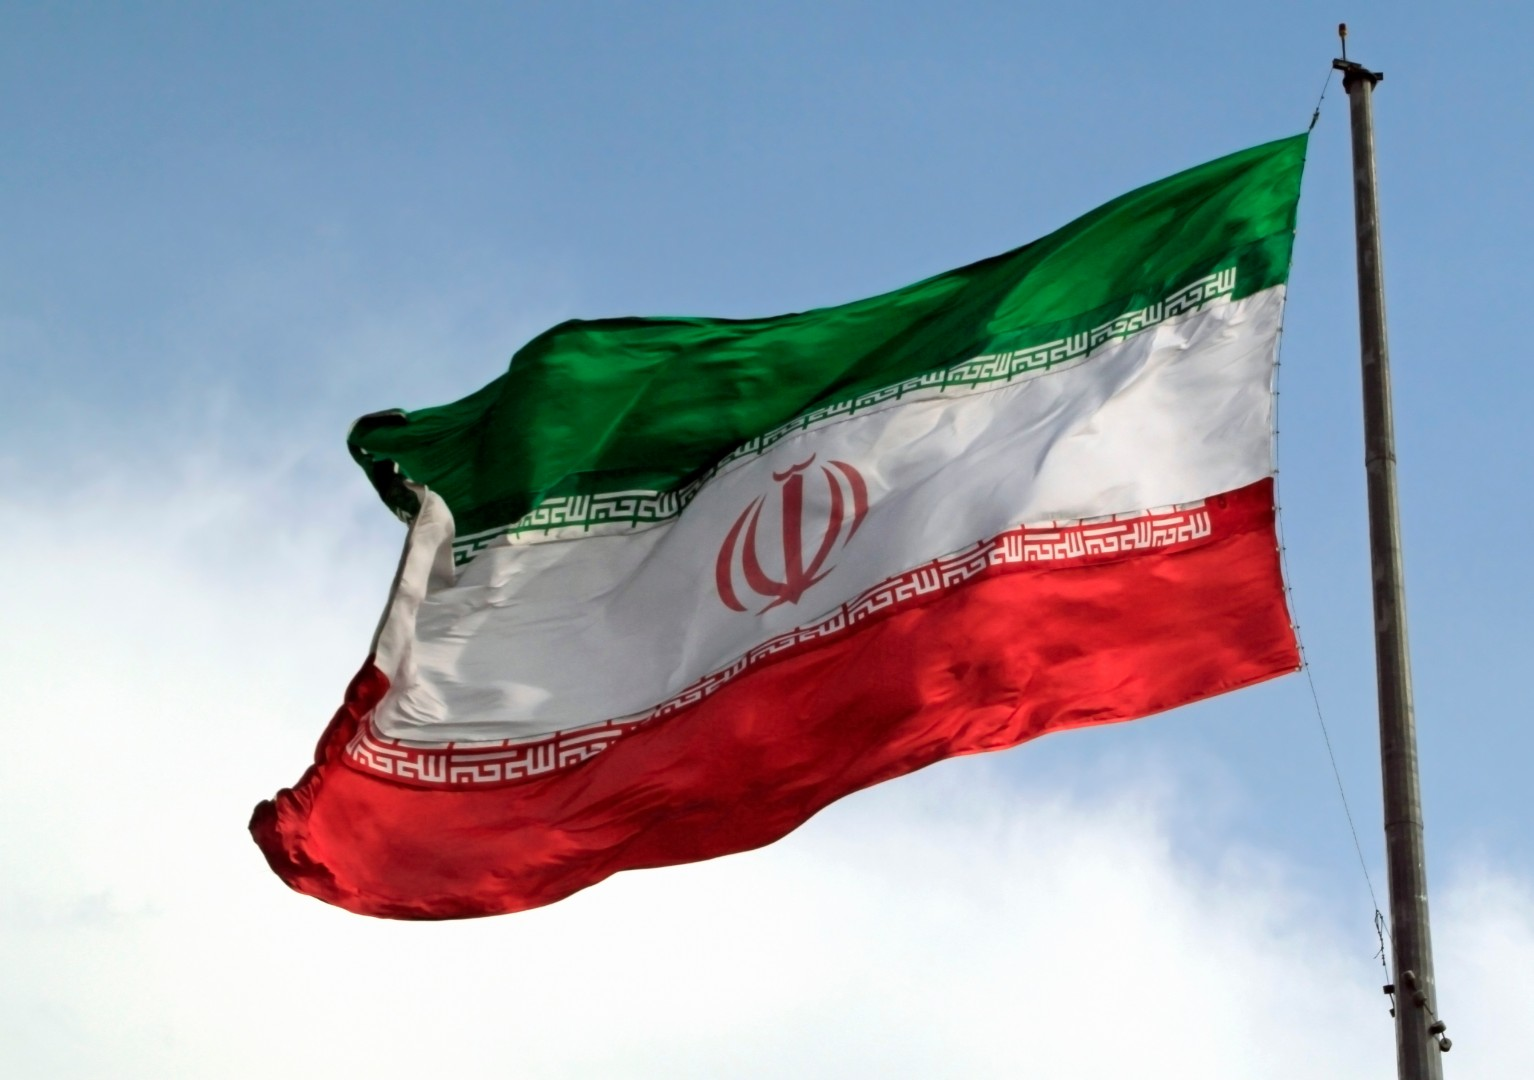 Page Turner May Iranian Flag